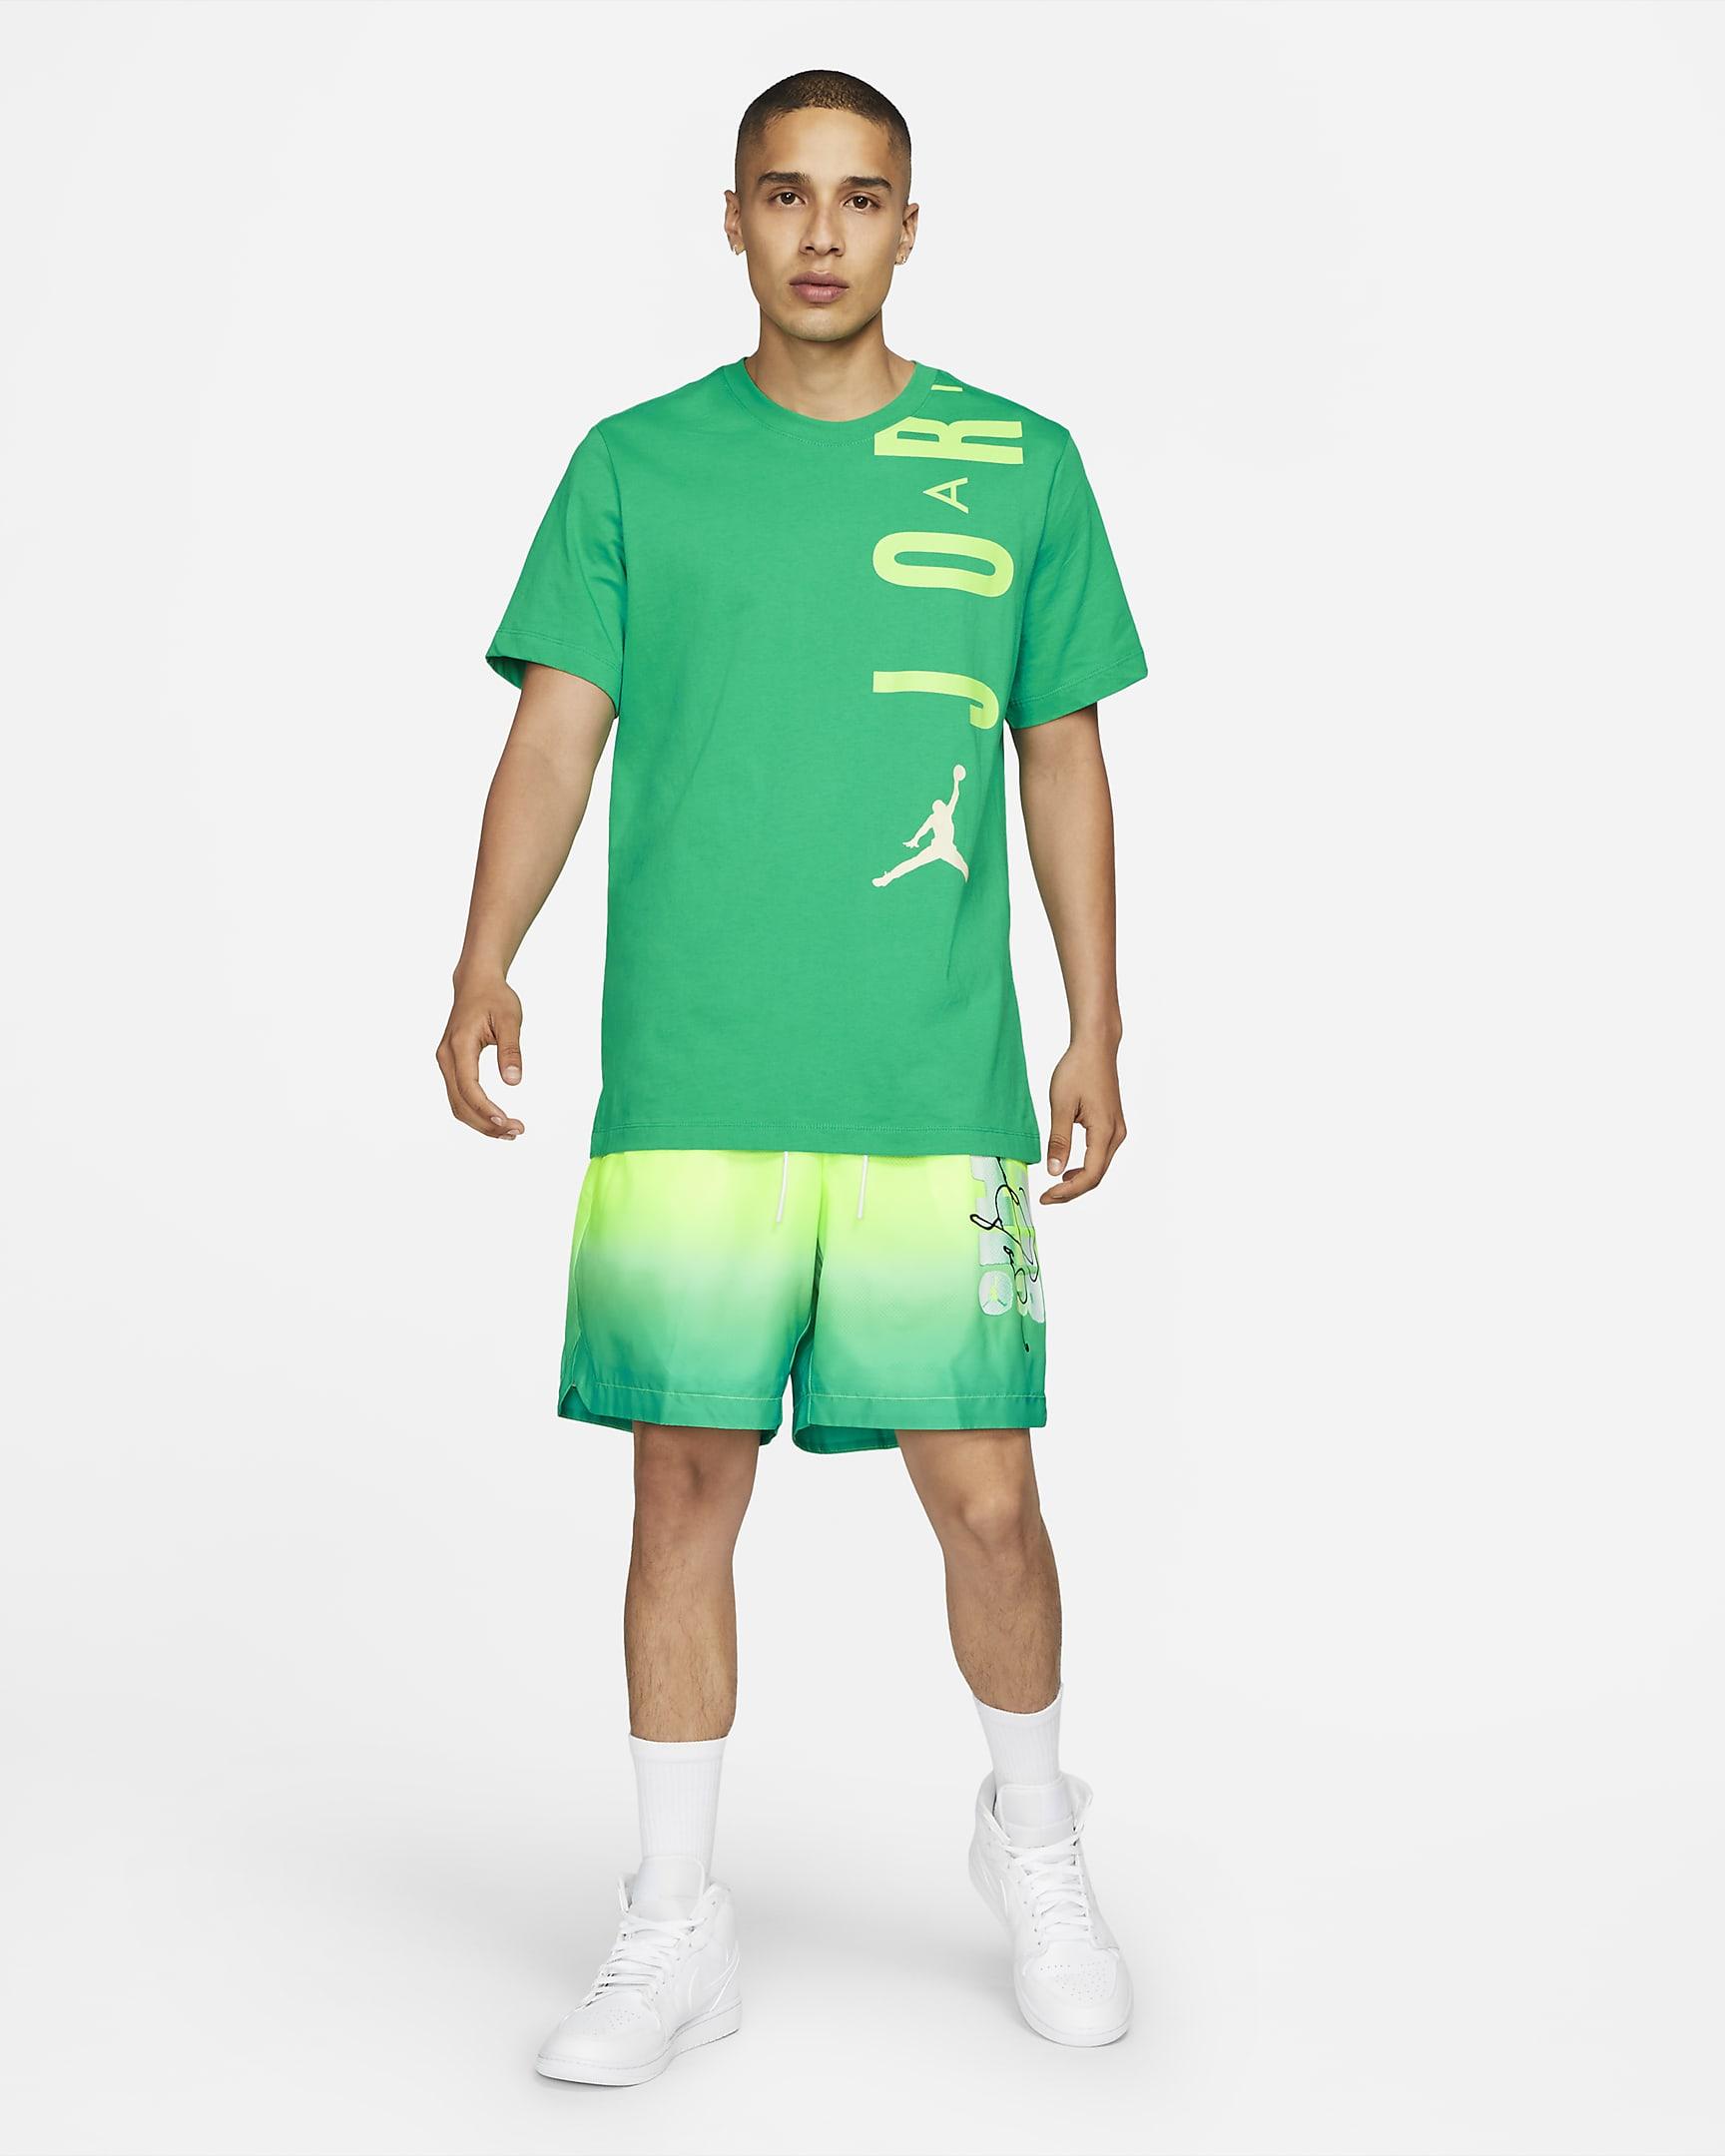 jordan-sport-dna-mens-pool-shorts-MklHwc-5.png